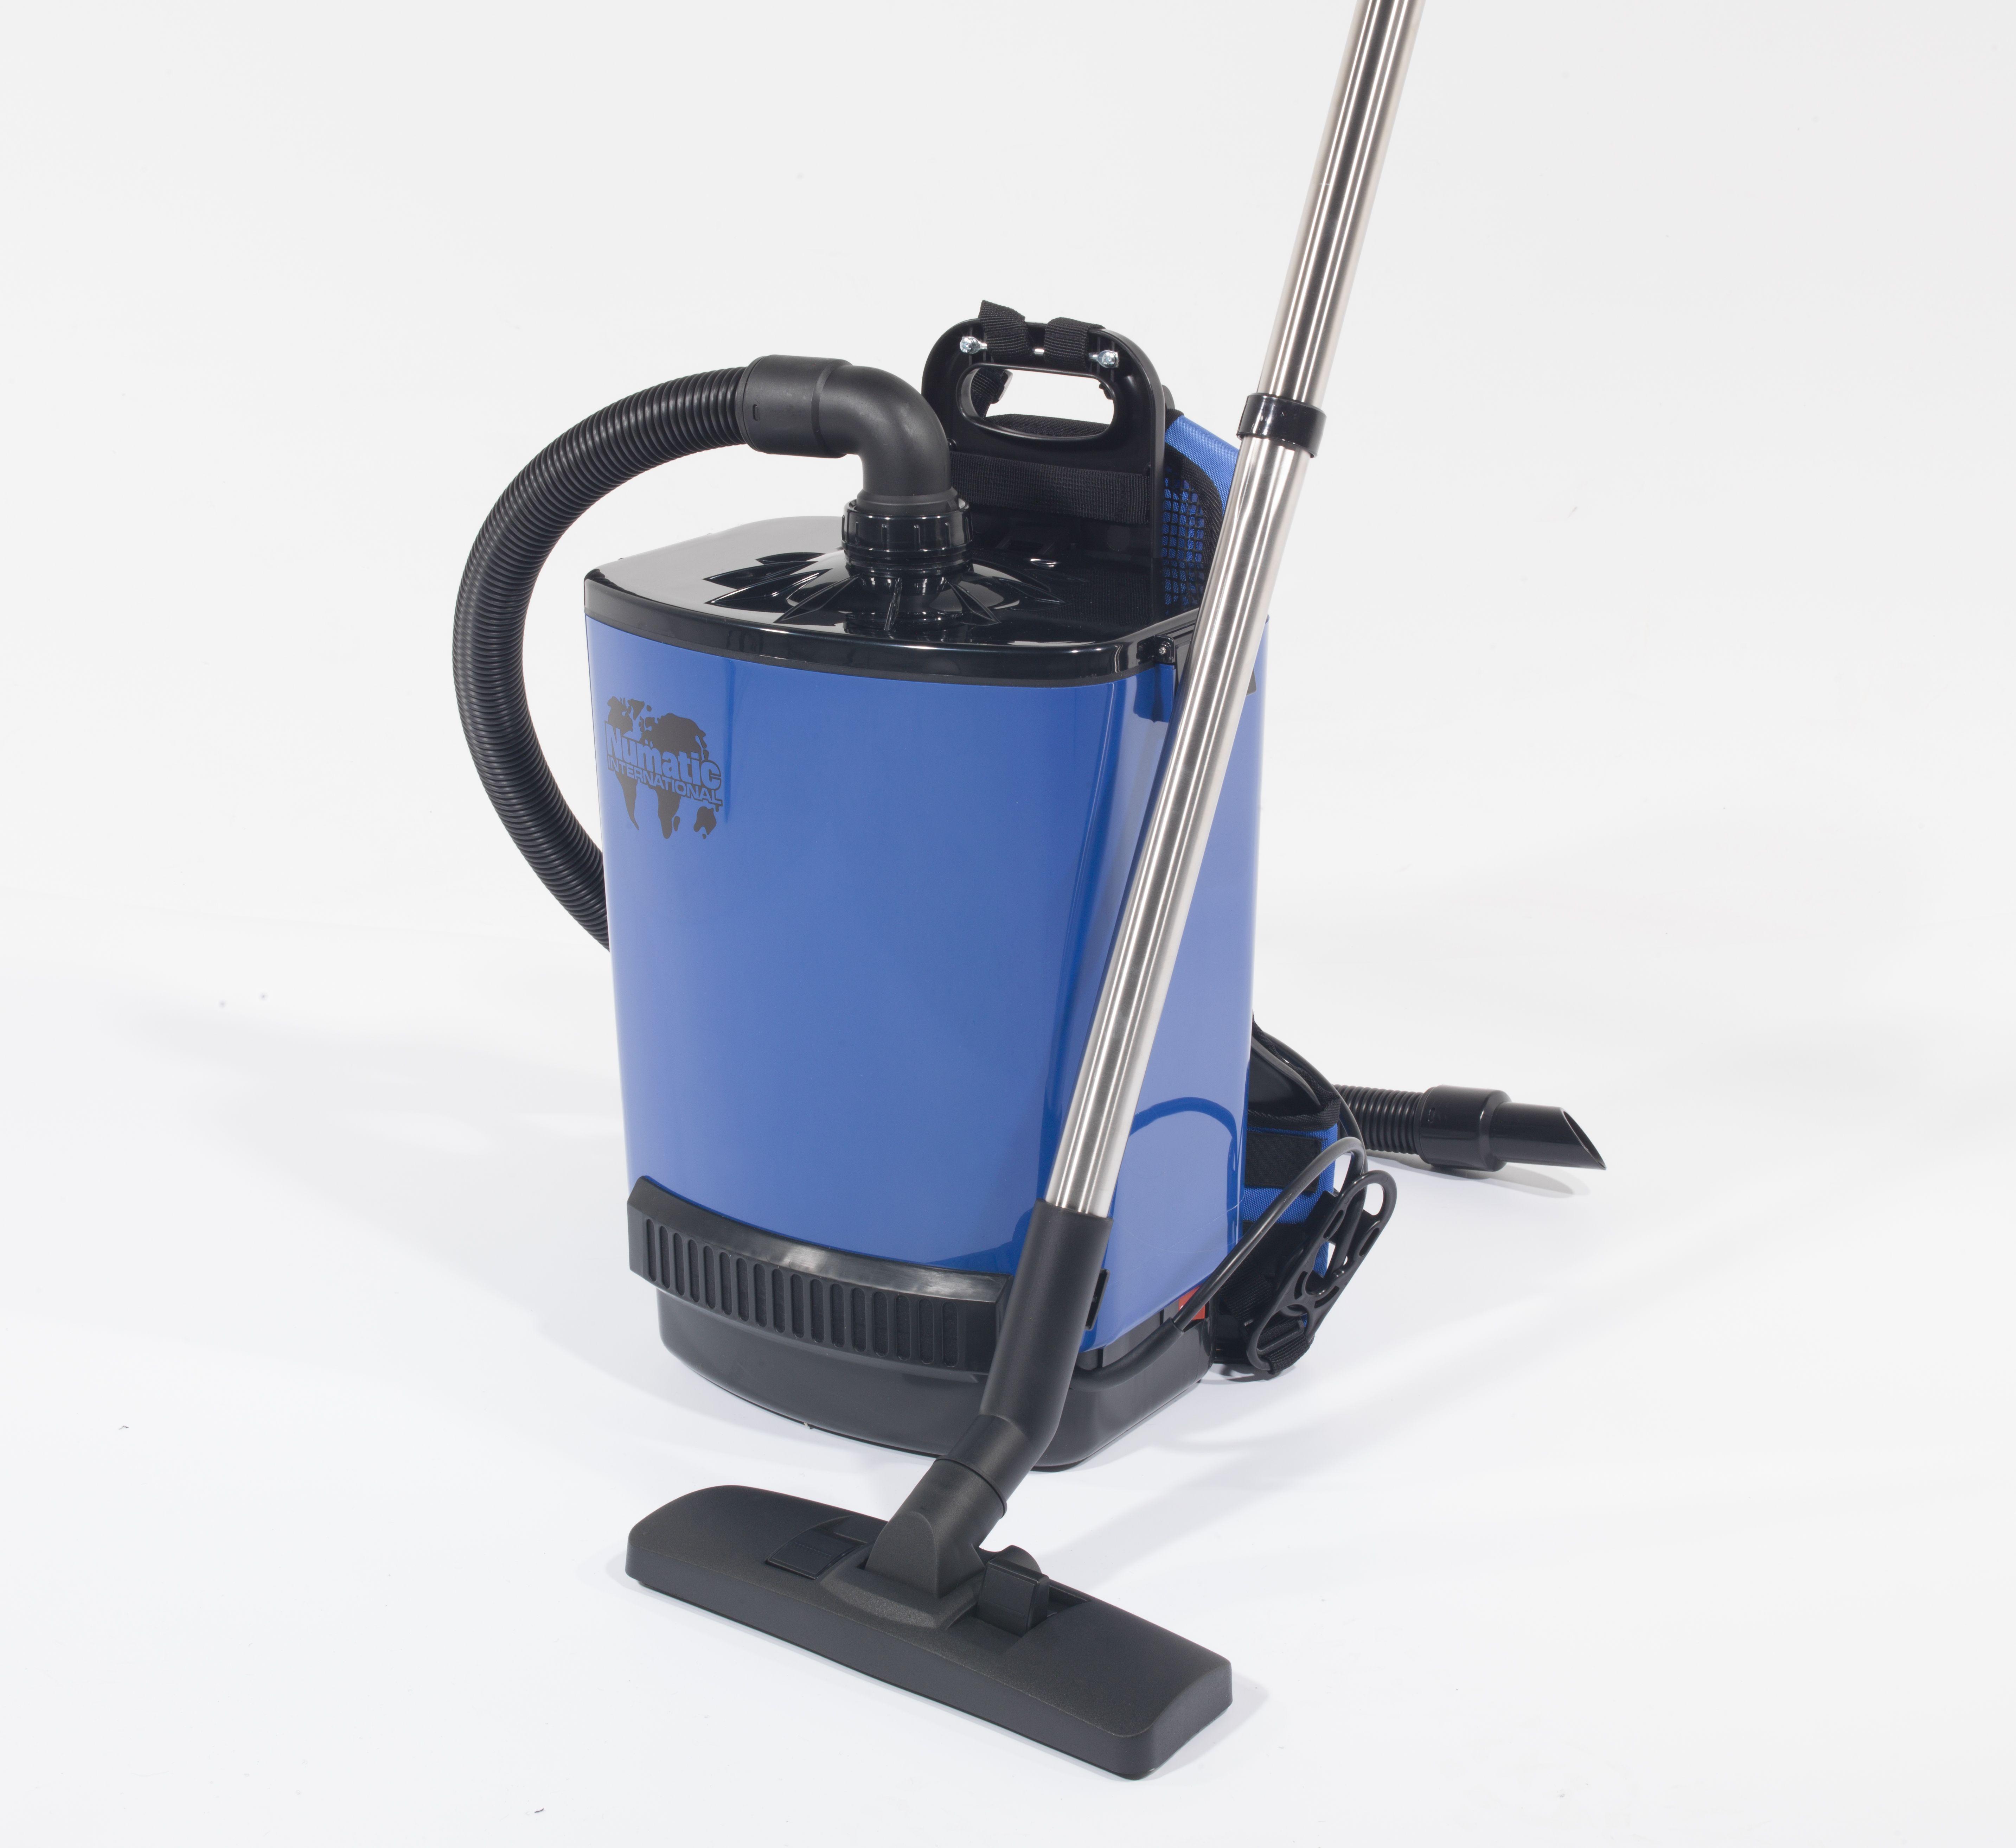 Rugstofzuiger RSV200-11 blauw met kit AS30